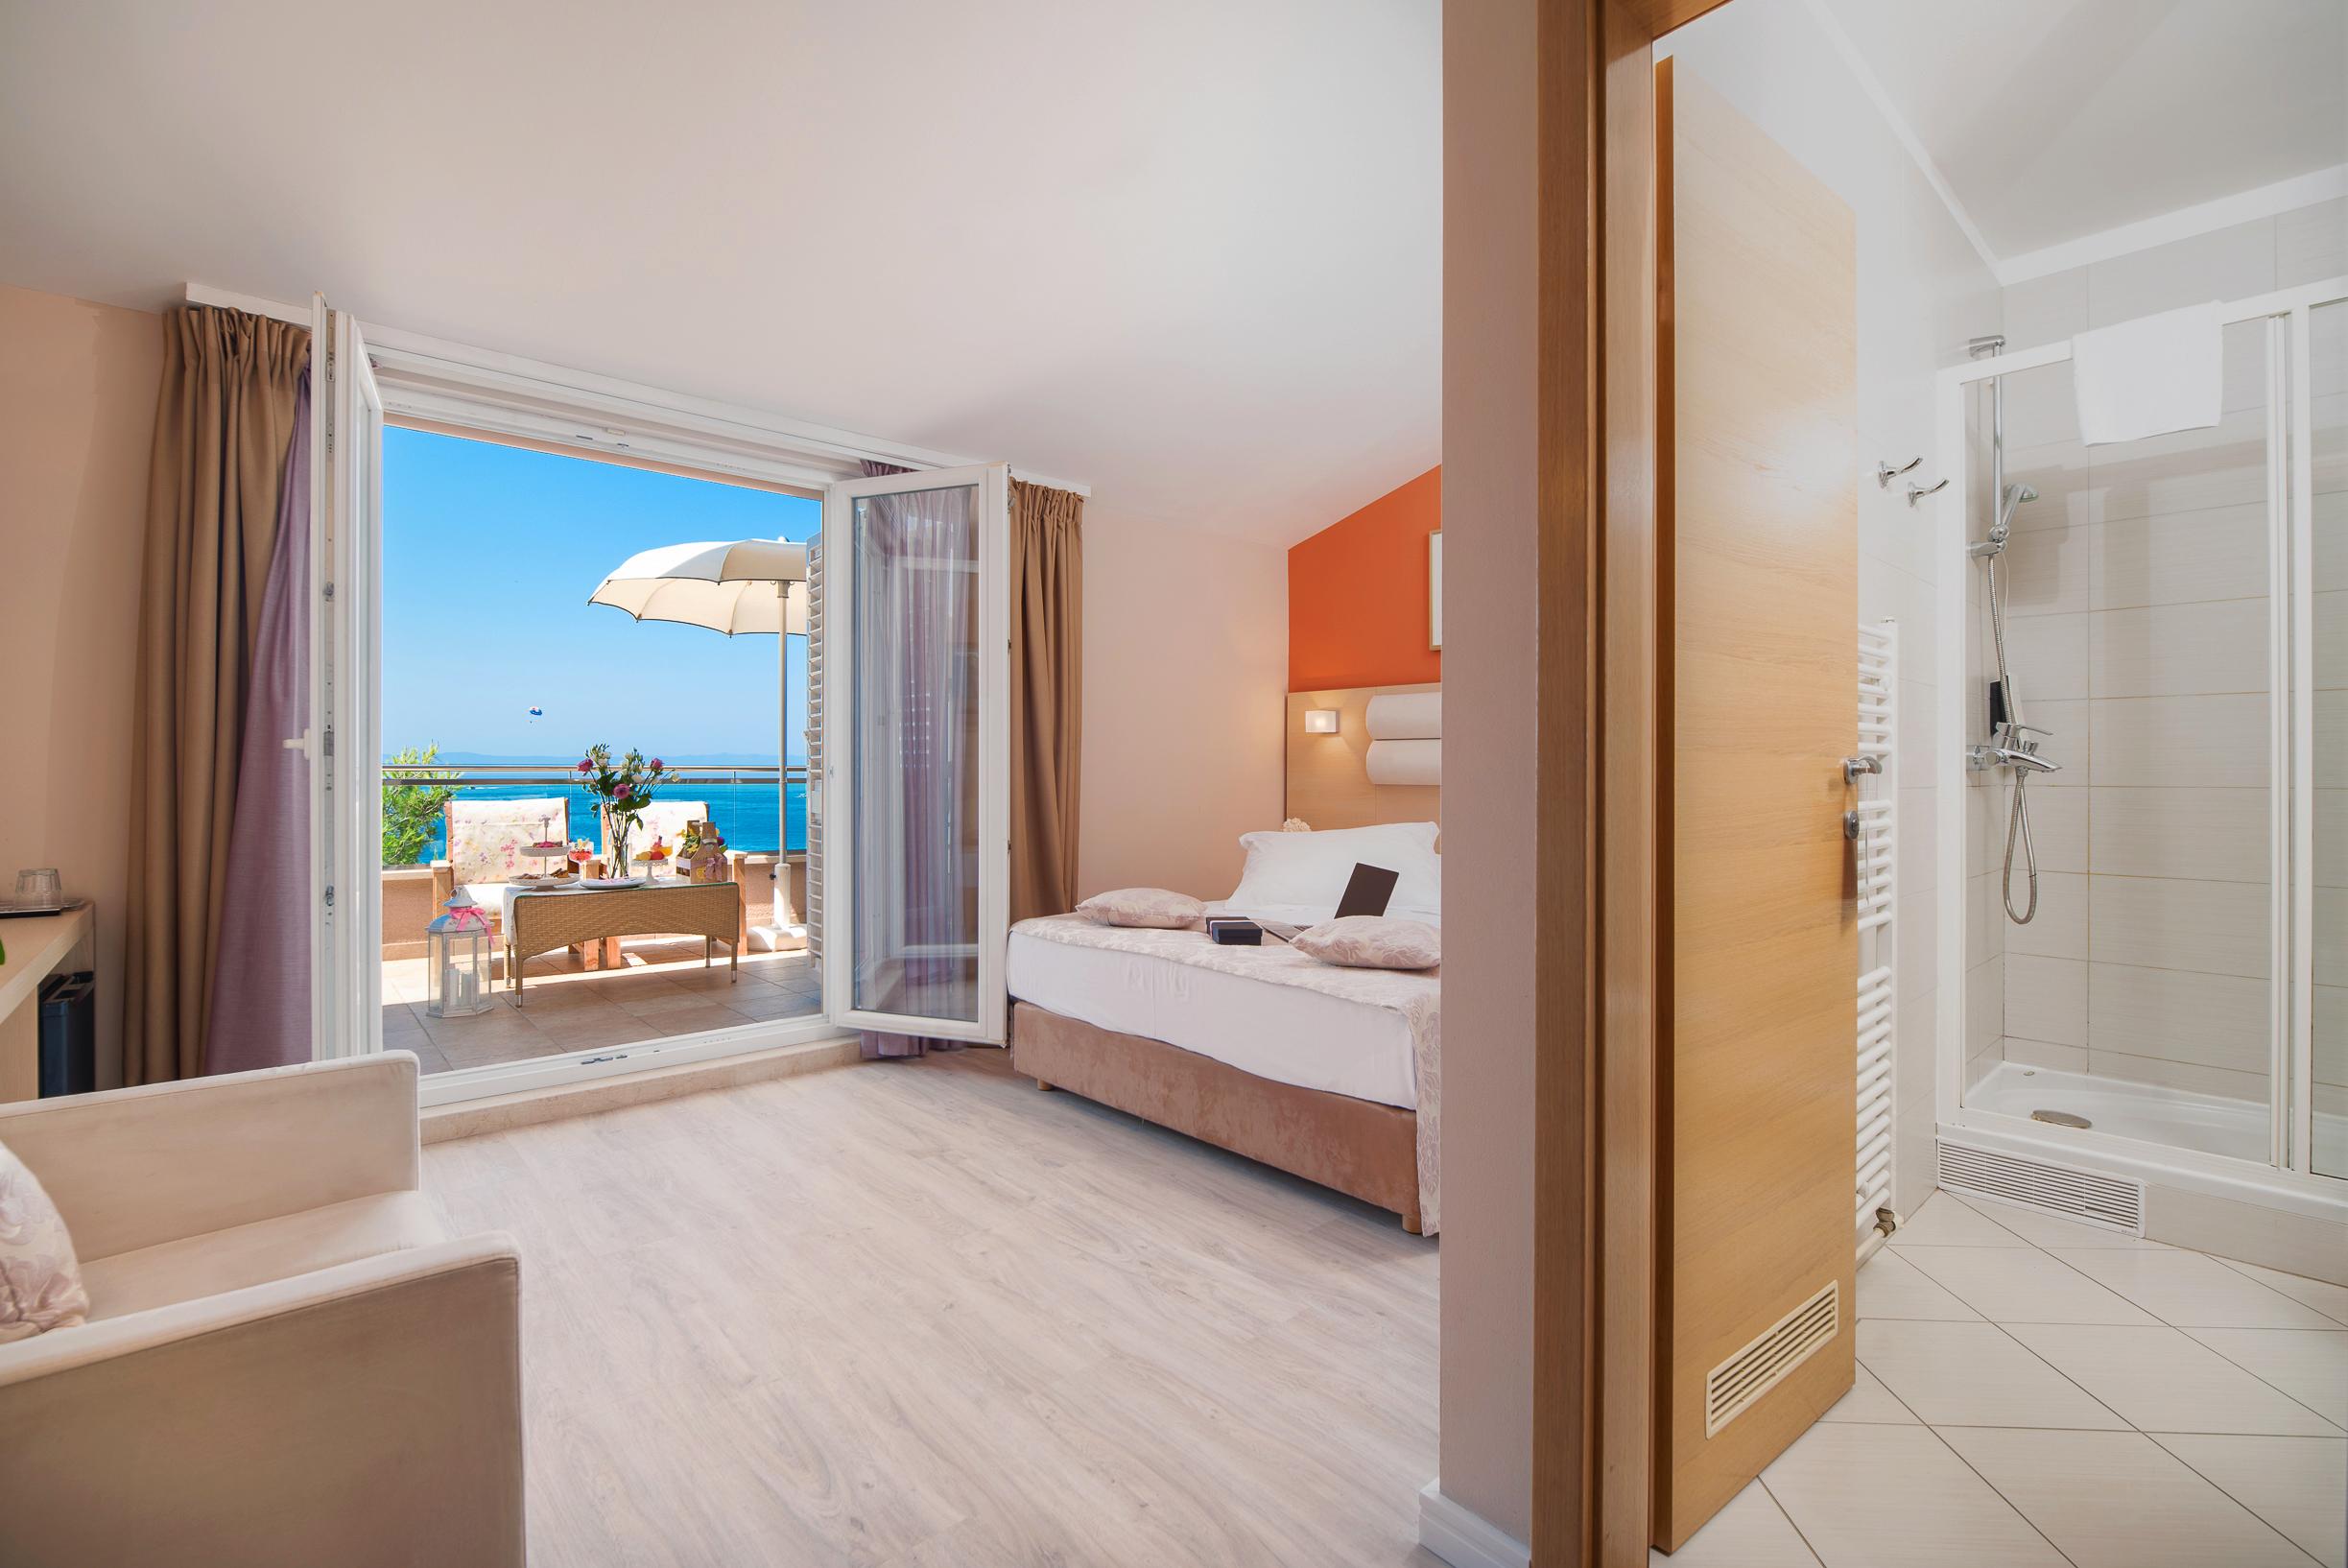 Hotel-Maritimo-Soba-4.1-2